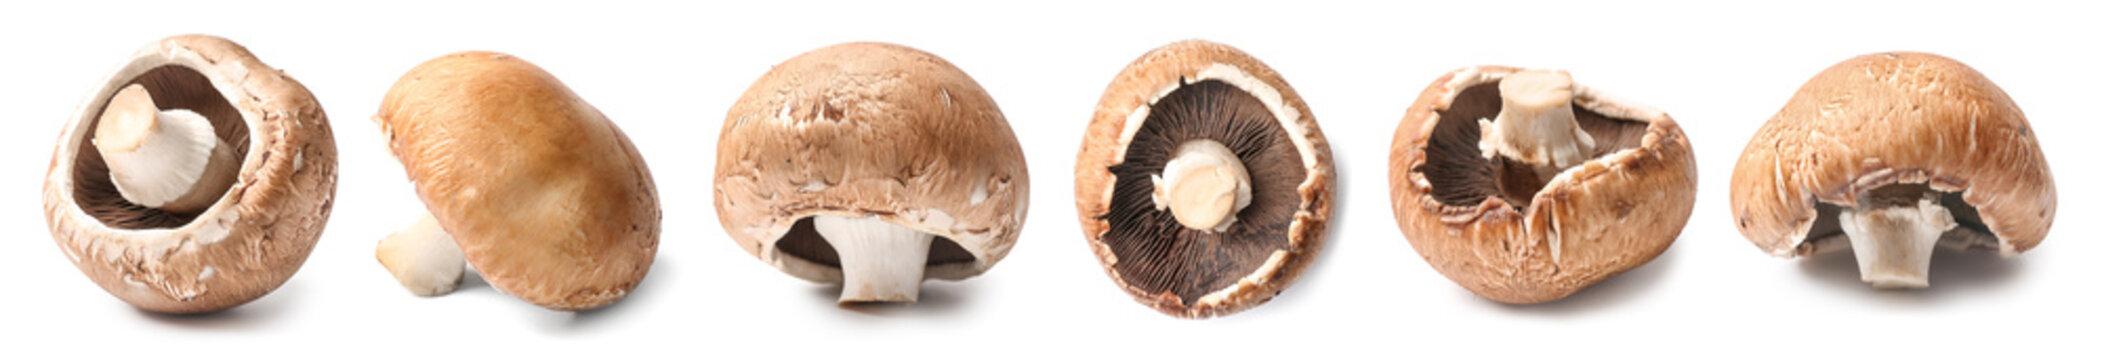 Fresh champignon mushroom on white background